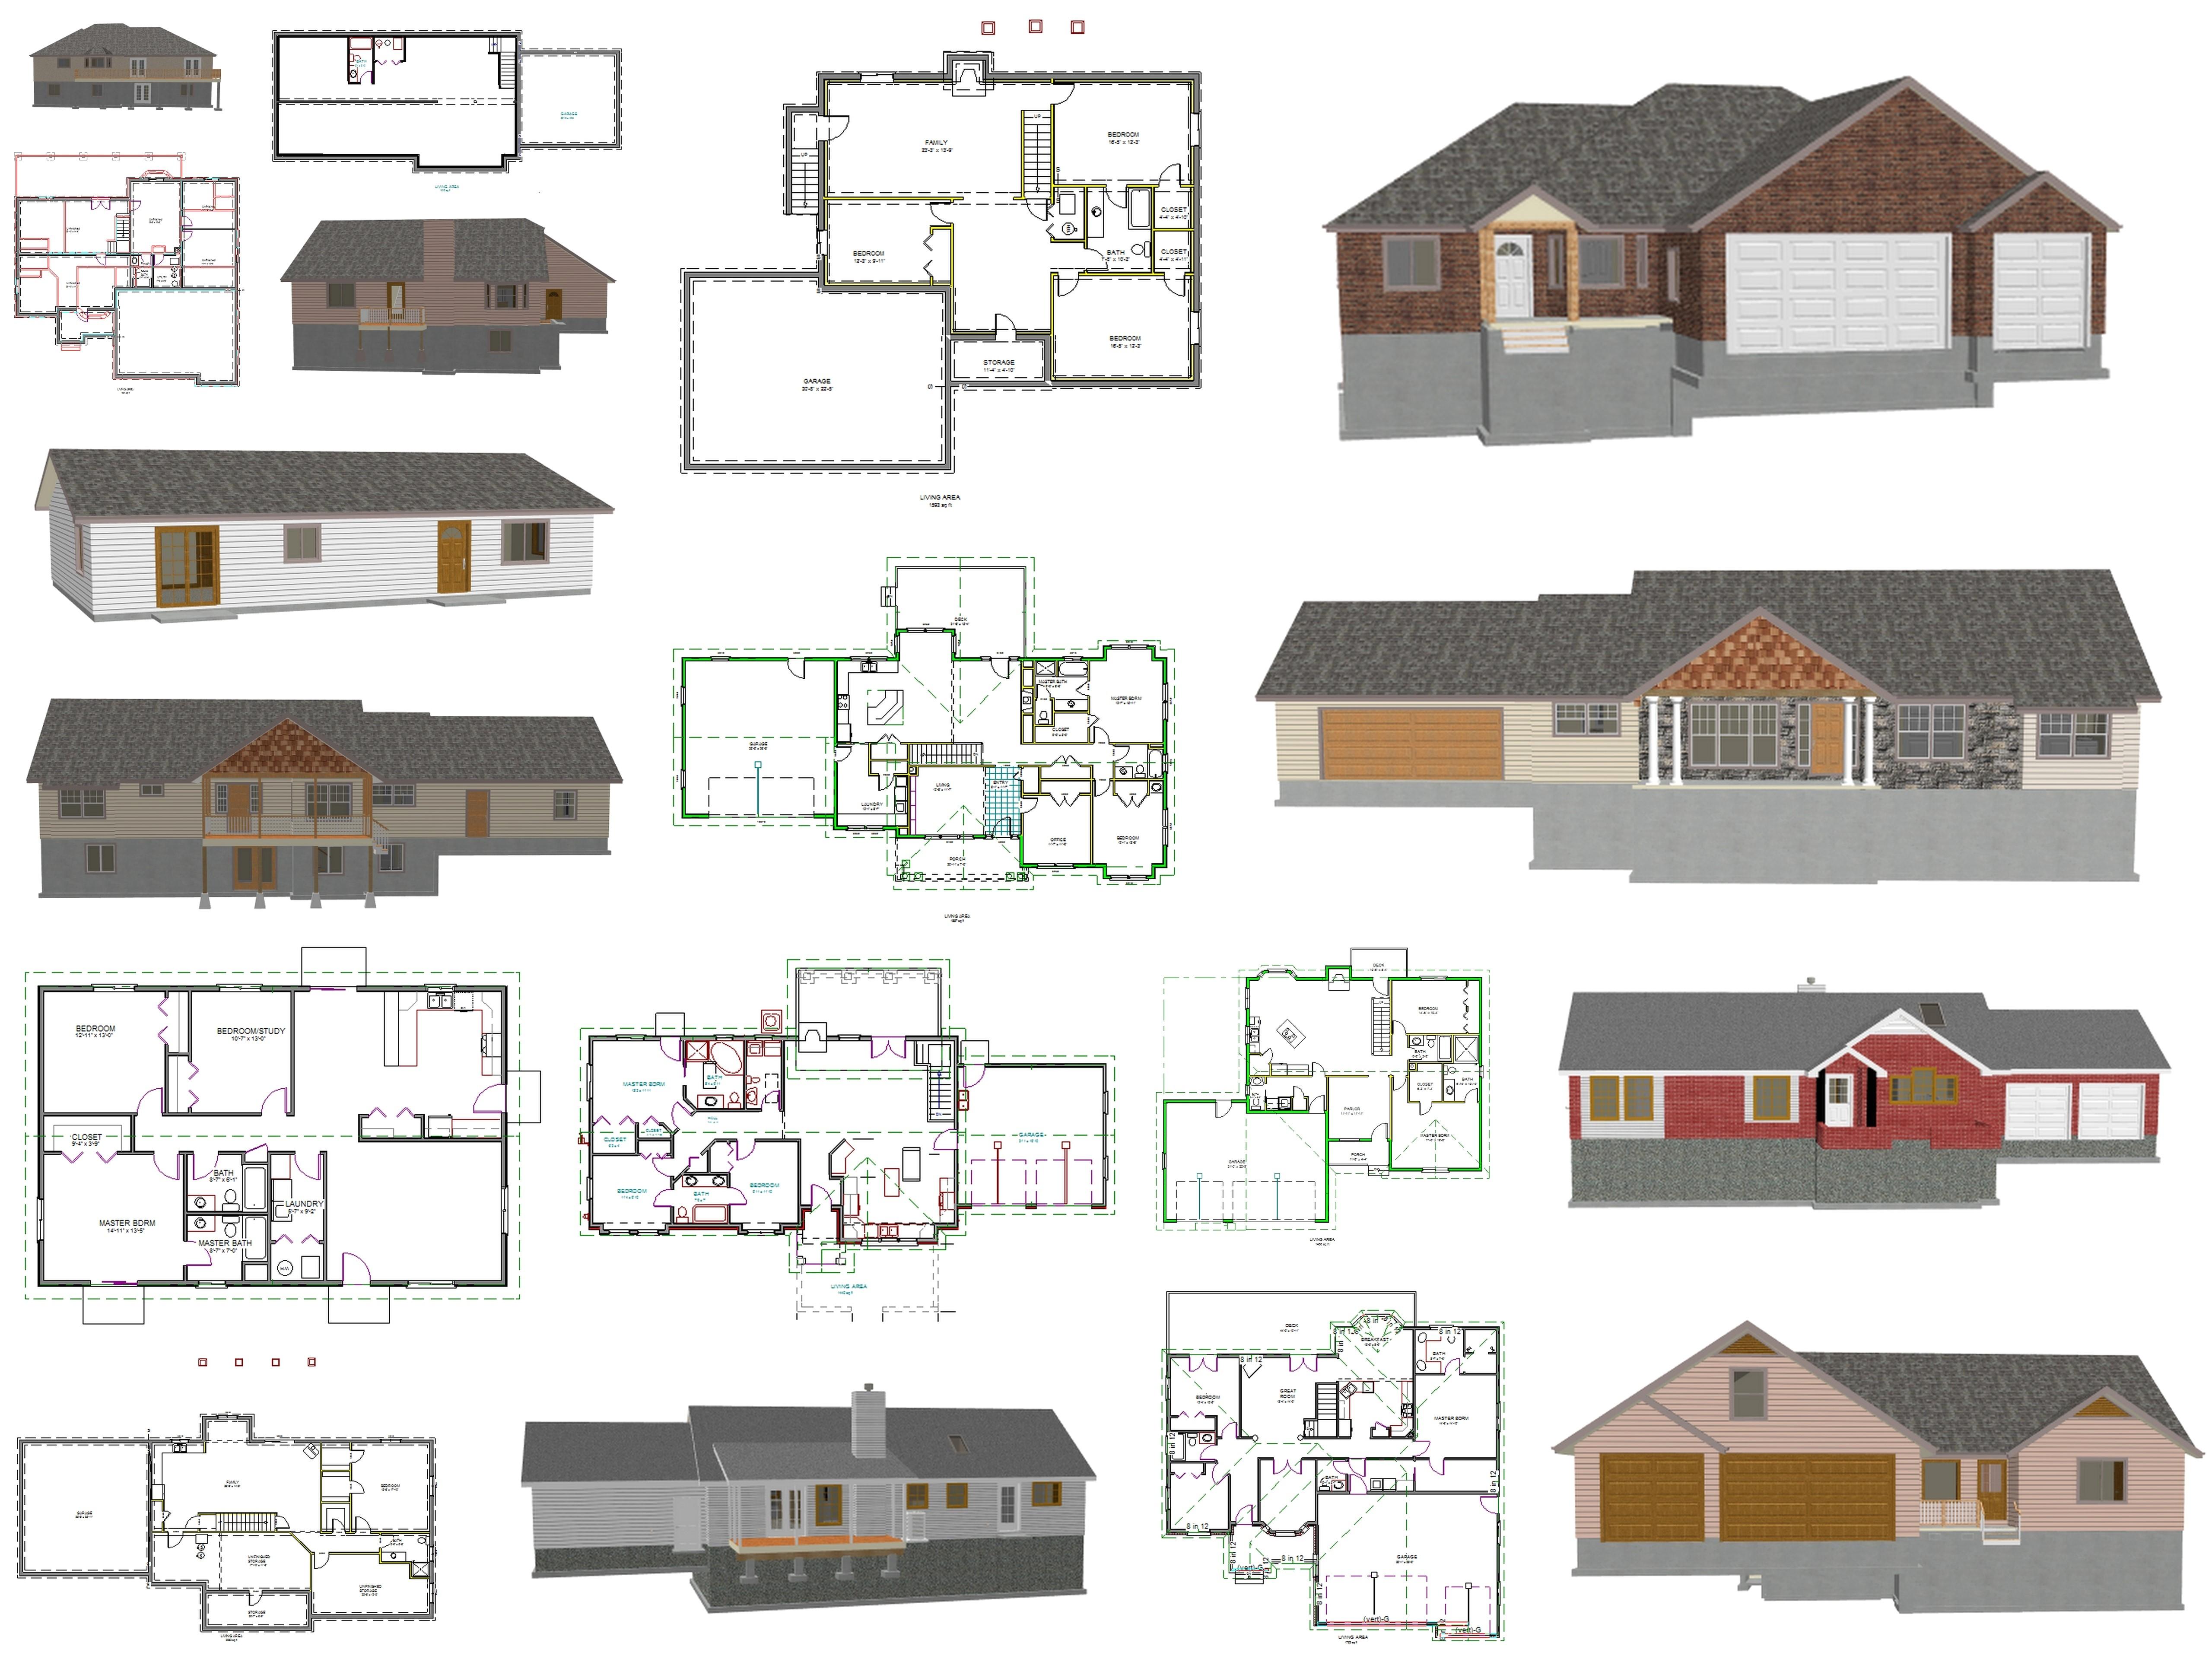 minecraft house floor plans